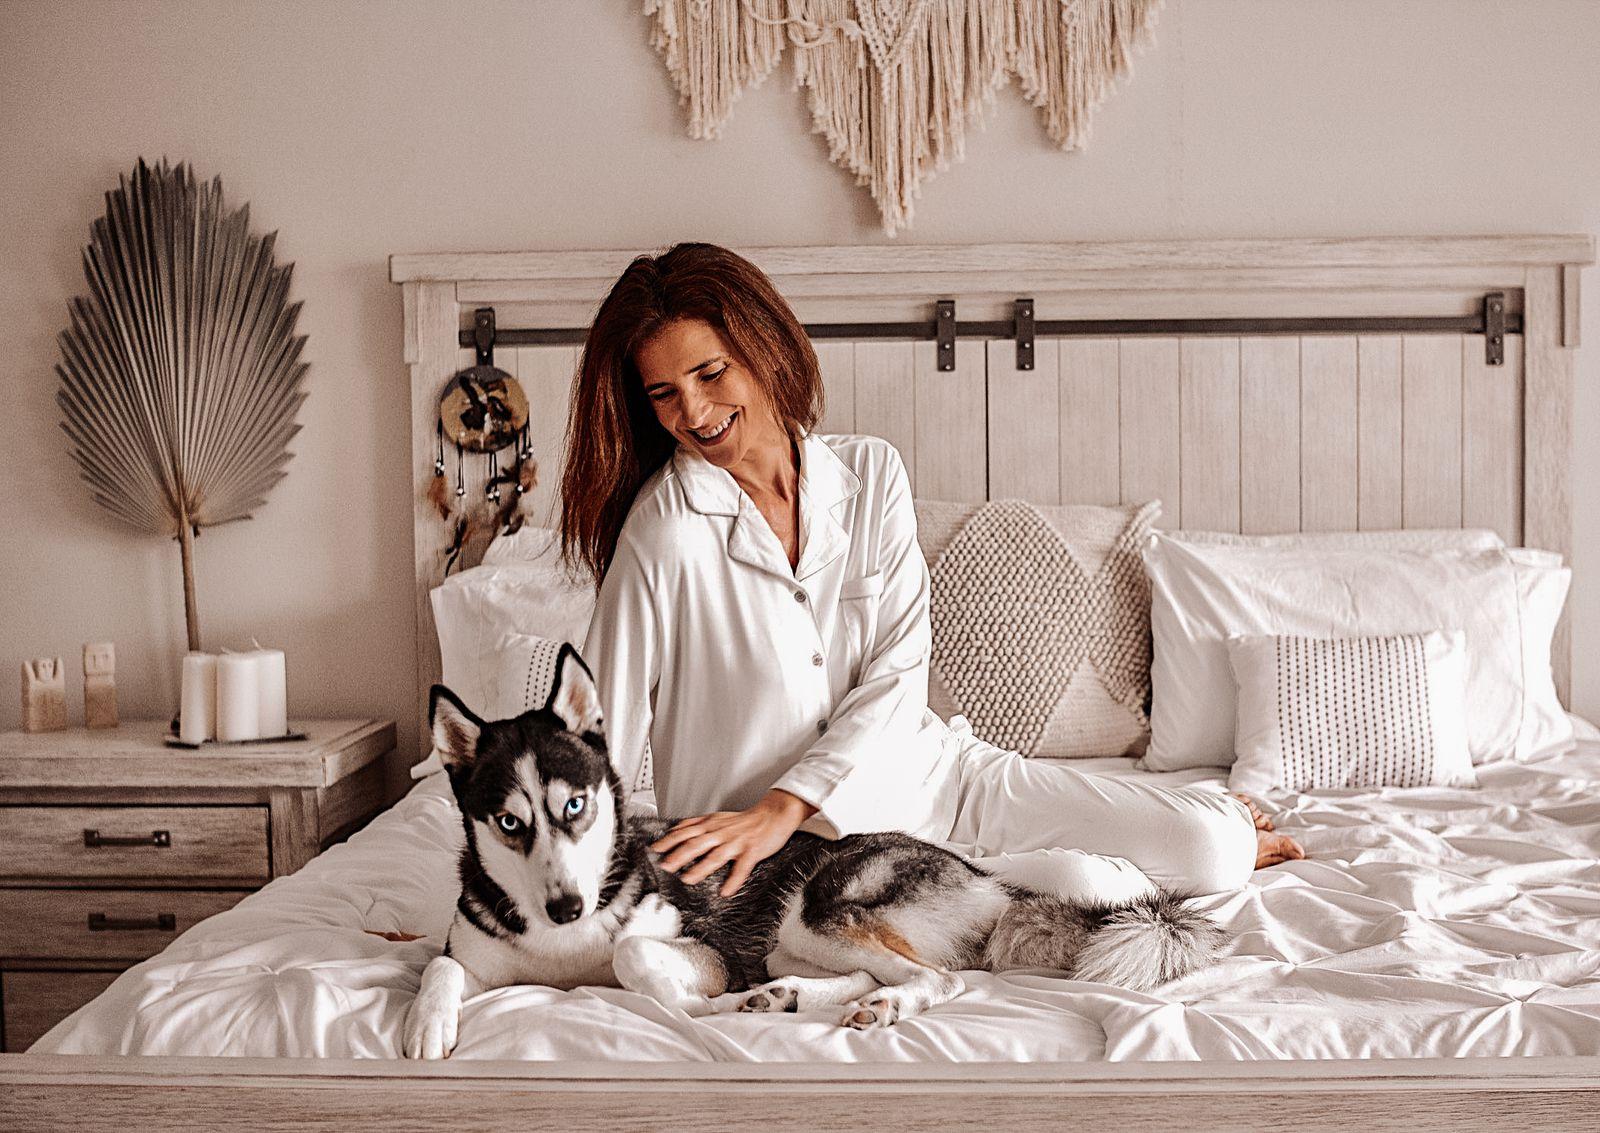 Cozy Earth loungewear : Not just pajamas!